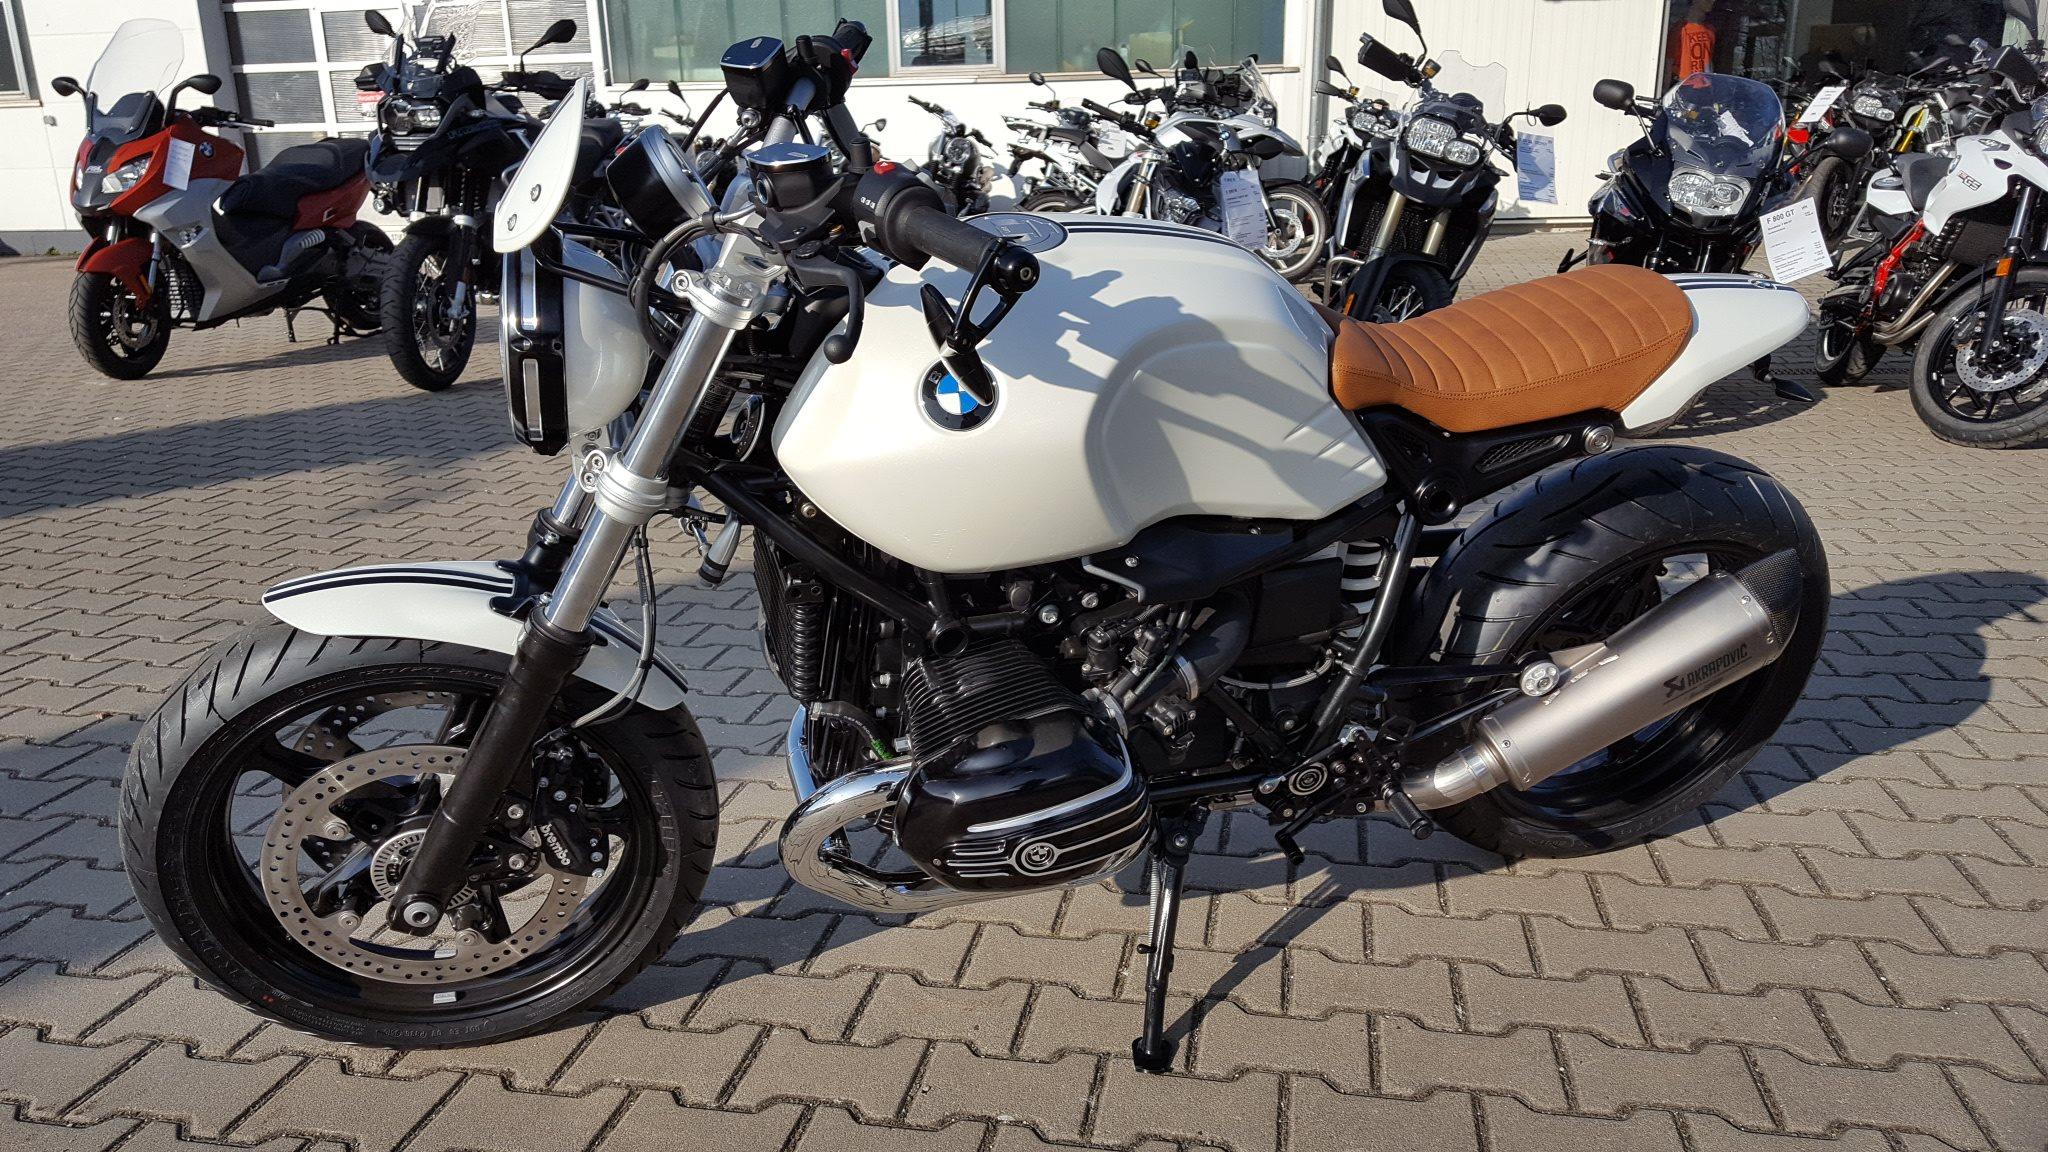 umgebautes motorrad bmw r ninet pure von motorradsport. Black Bedroom Furniture Sets. Home Design Ideas